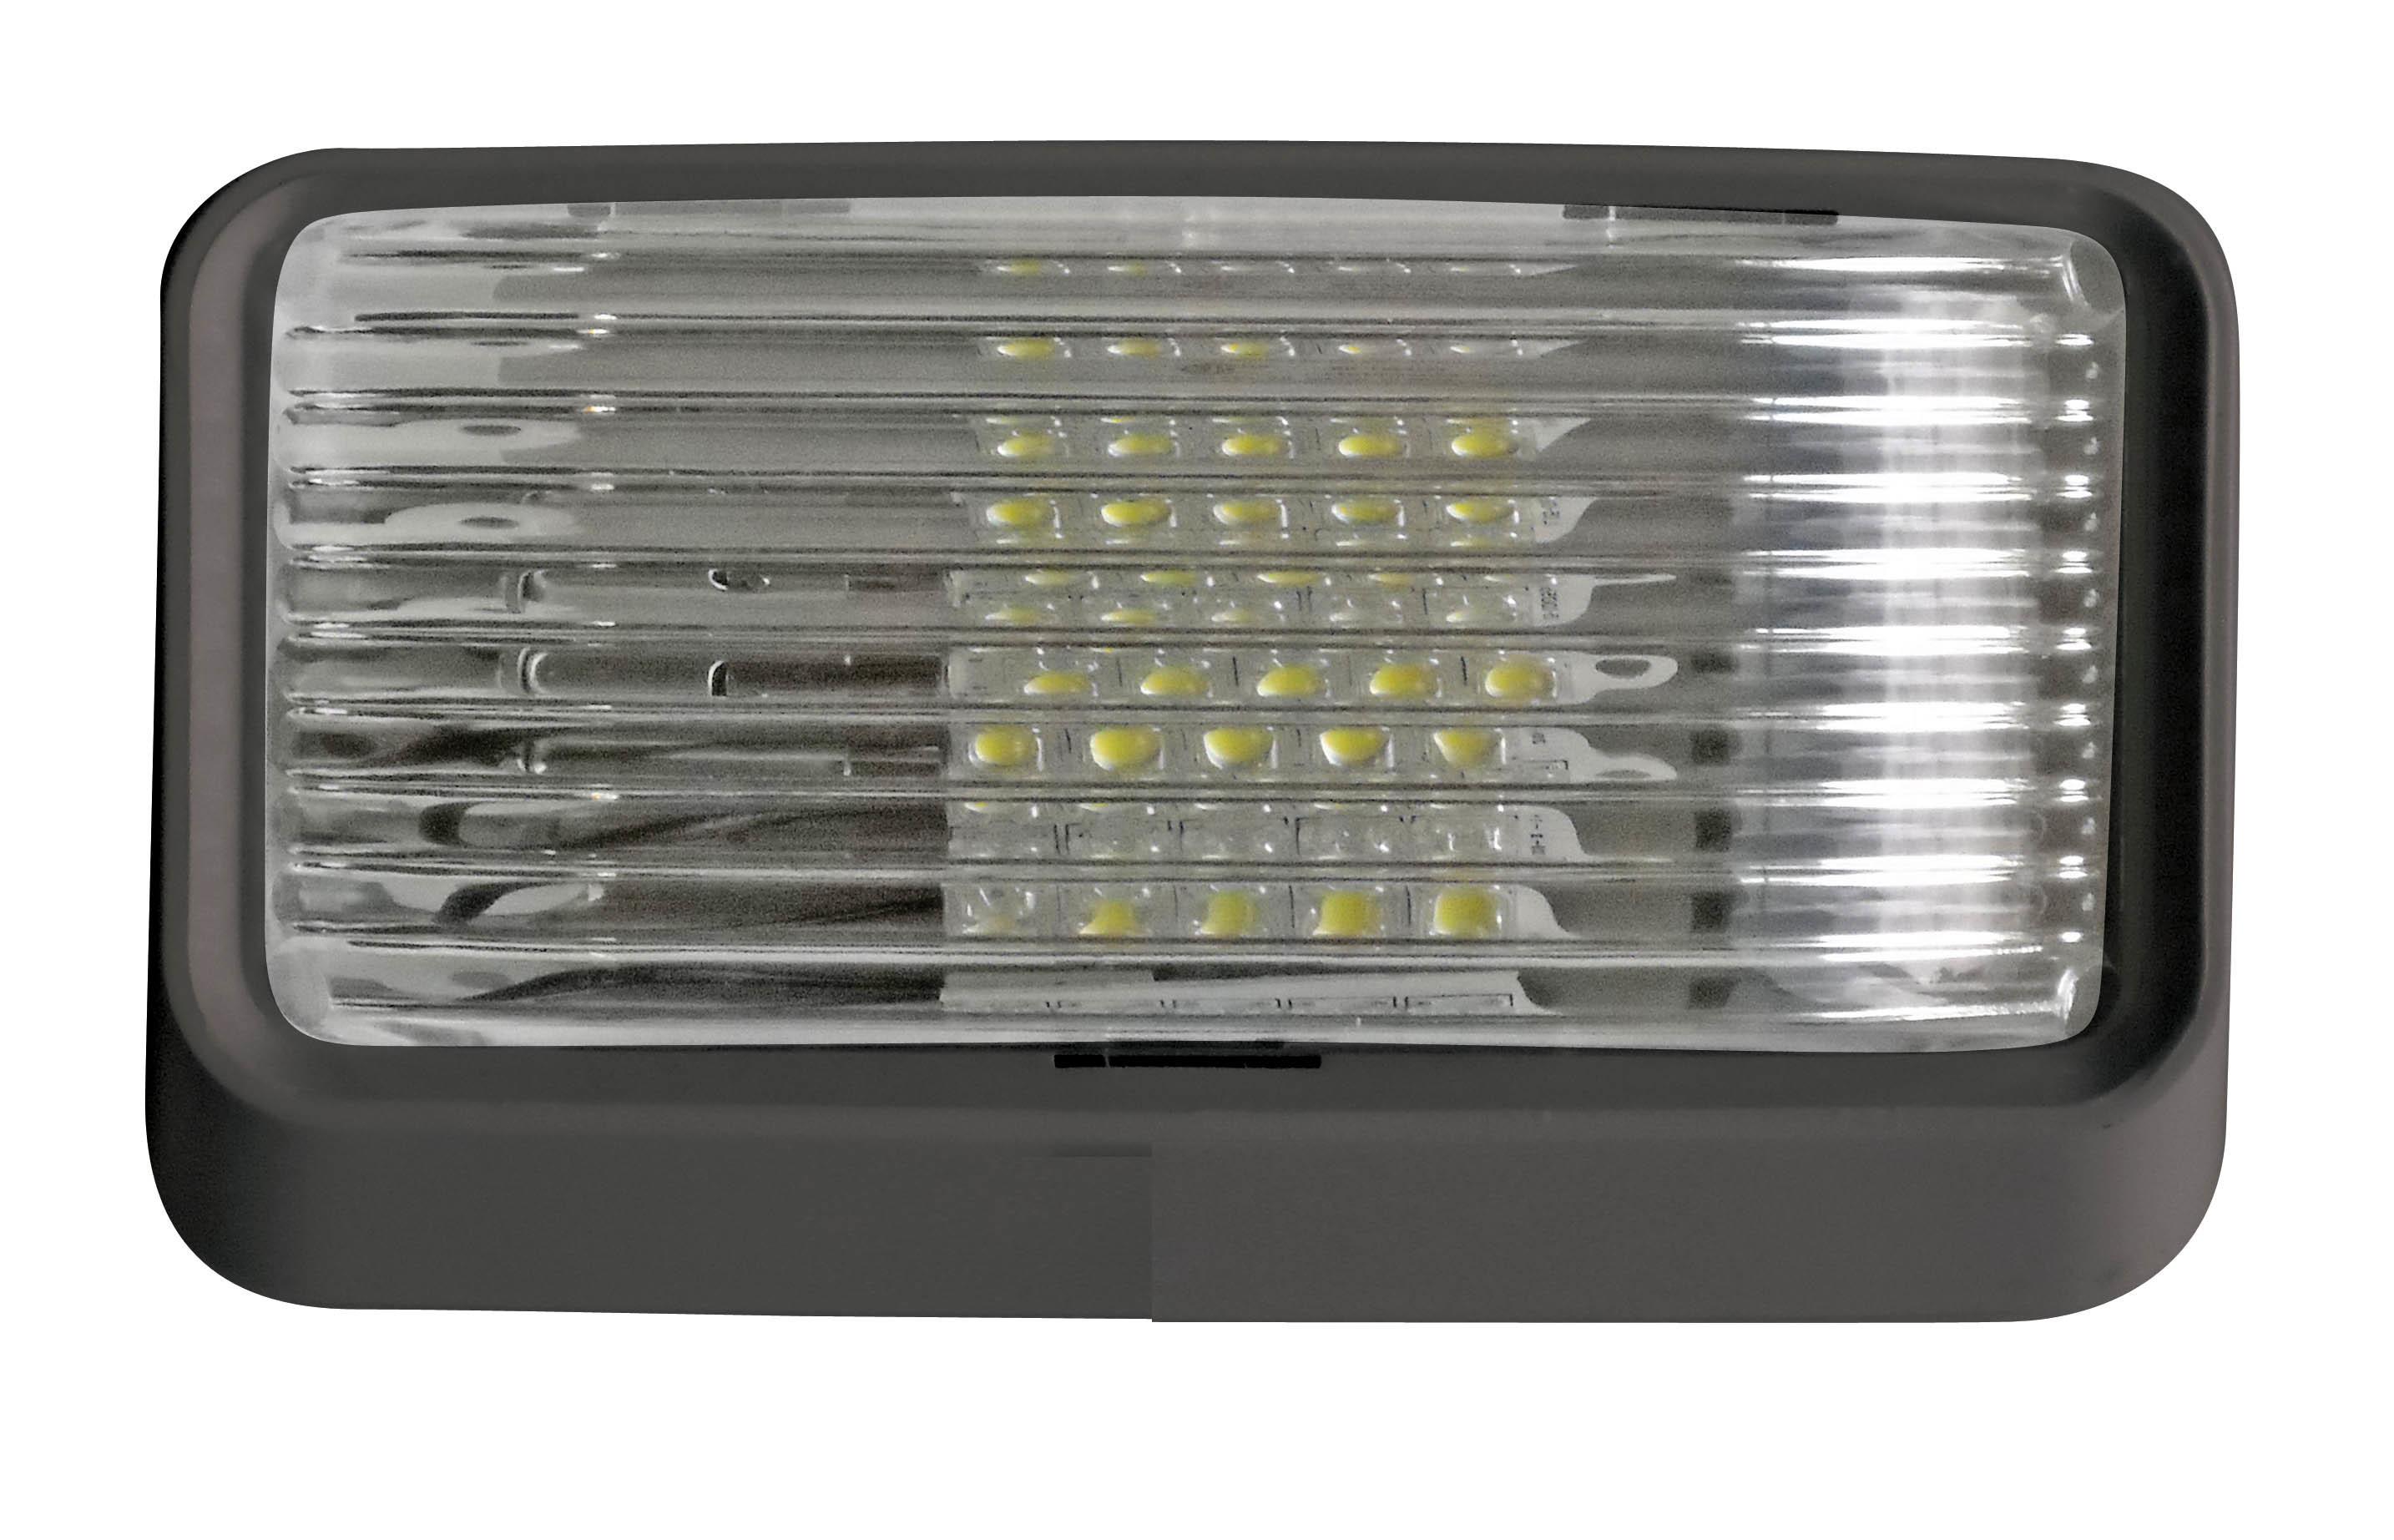 Black Surface Mount Standard Porch Light - No Switch 52729